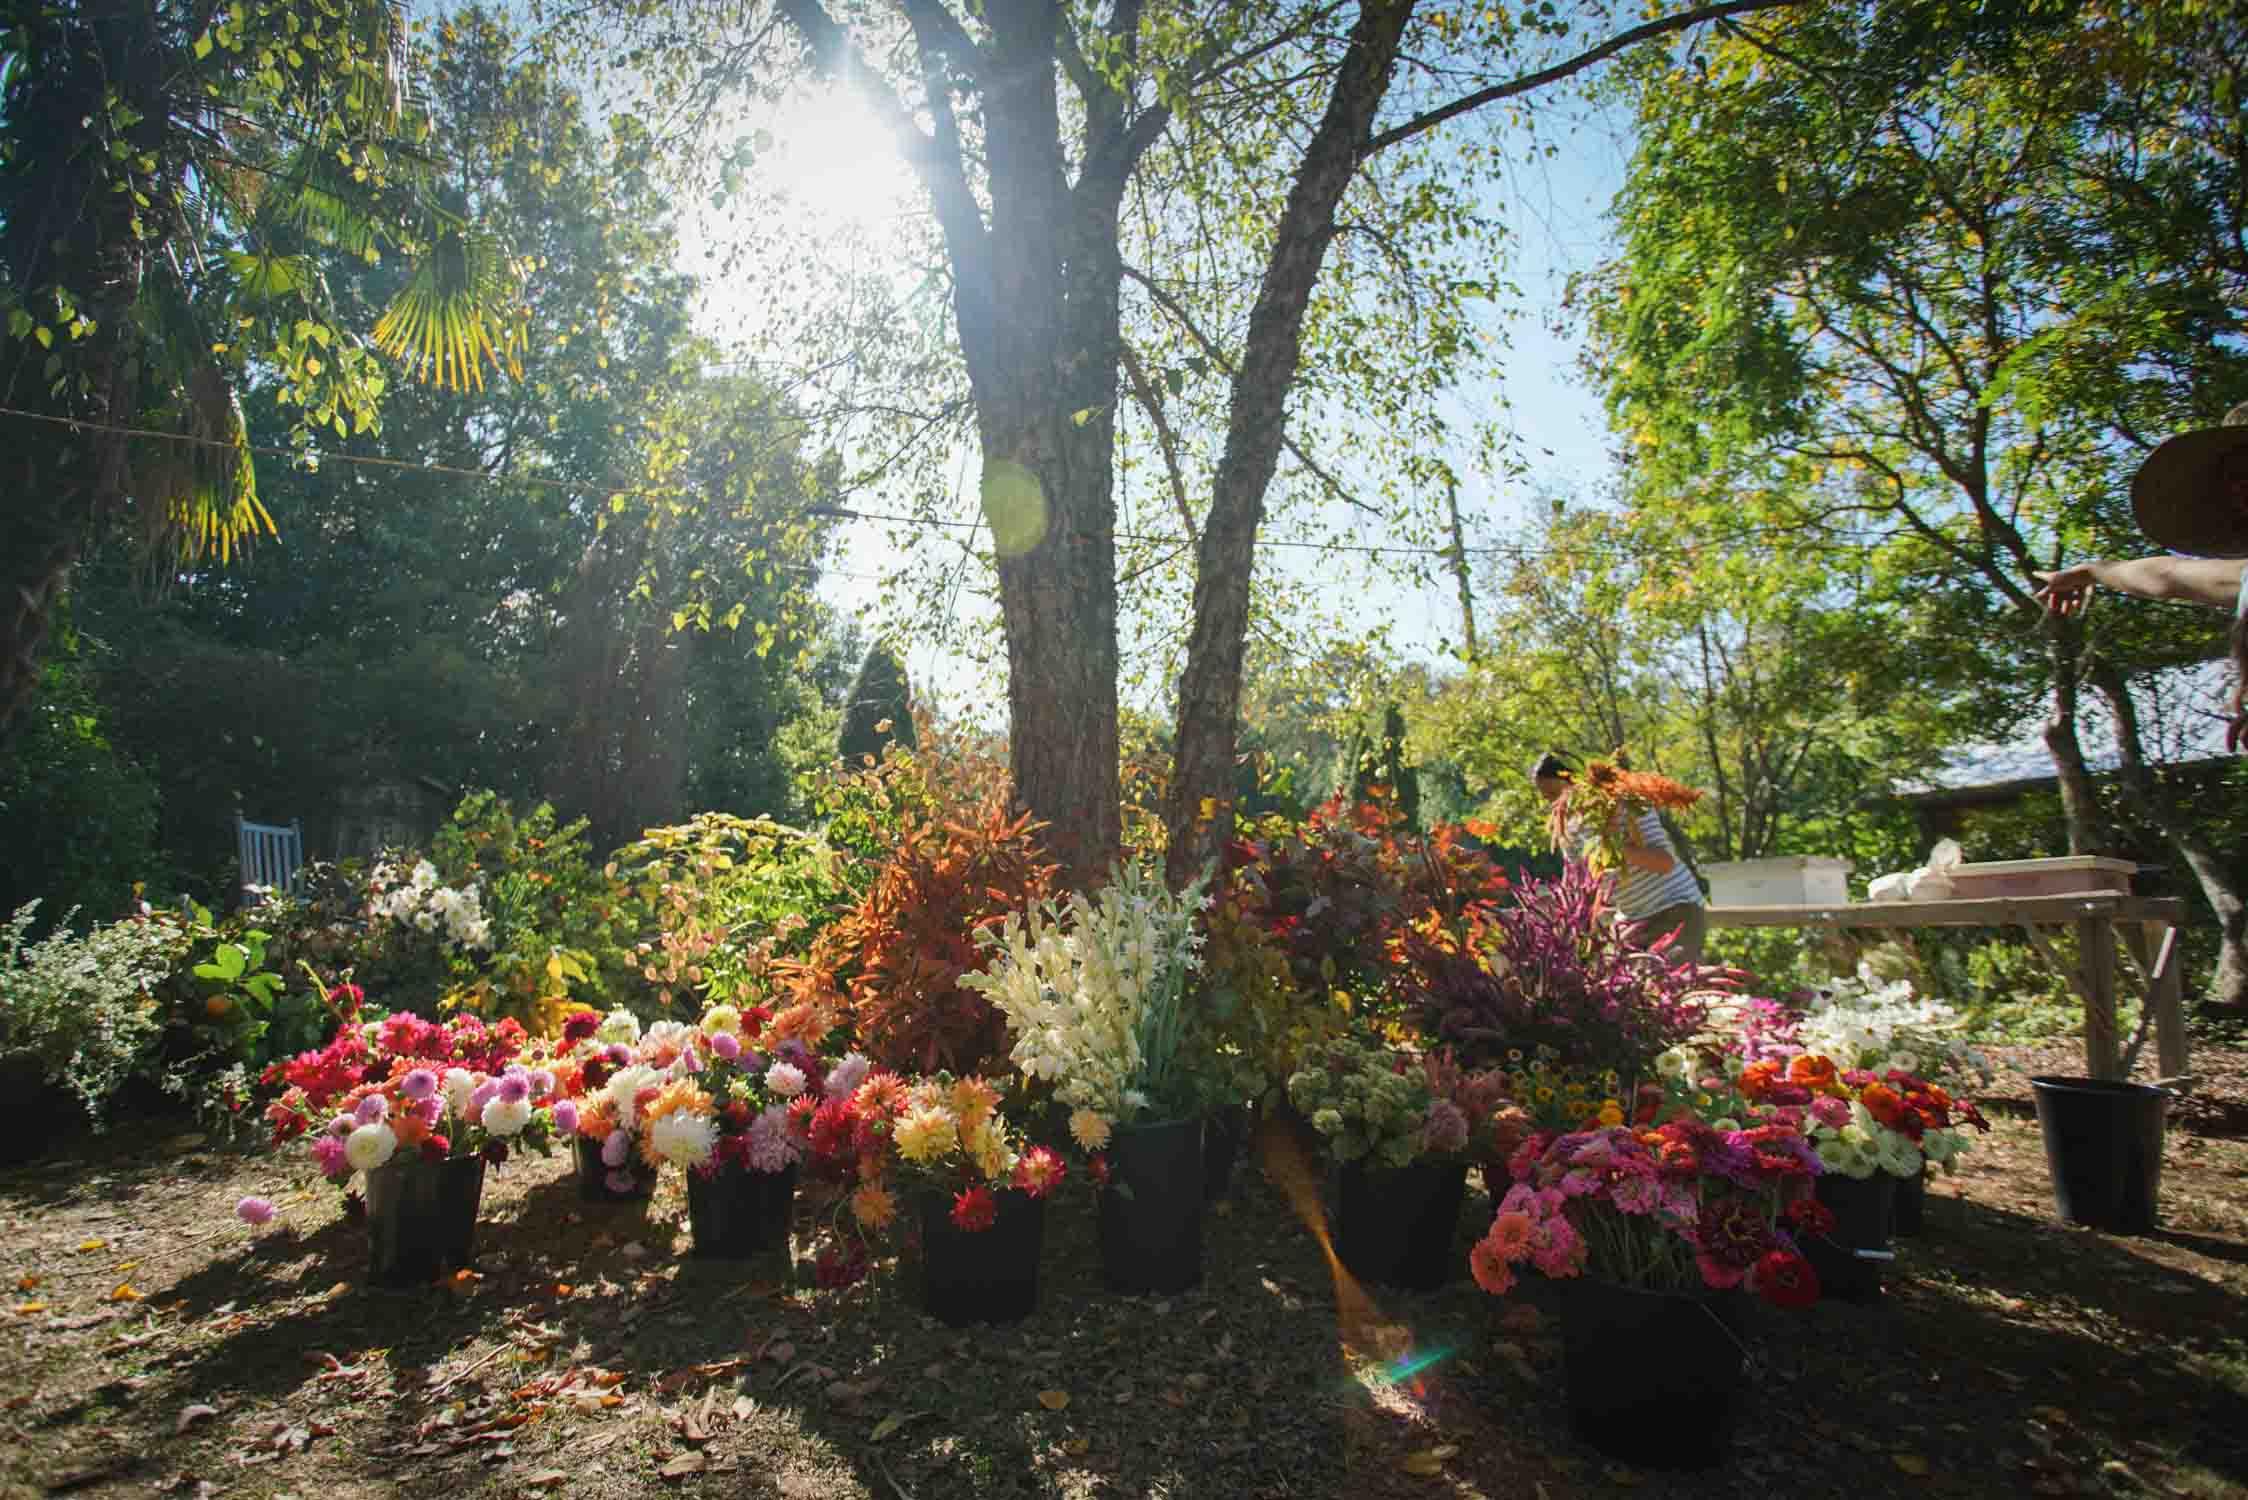 RA_3 porch farm 2016 flower social-2016101708939.jpg